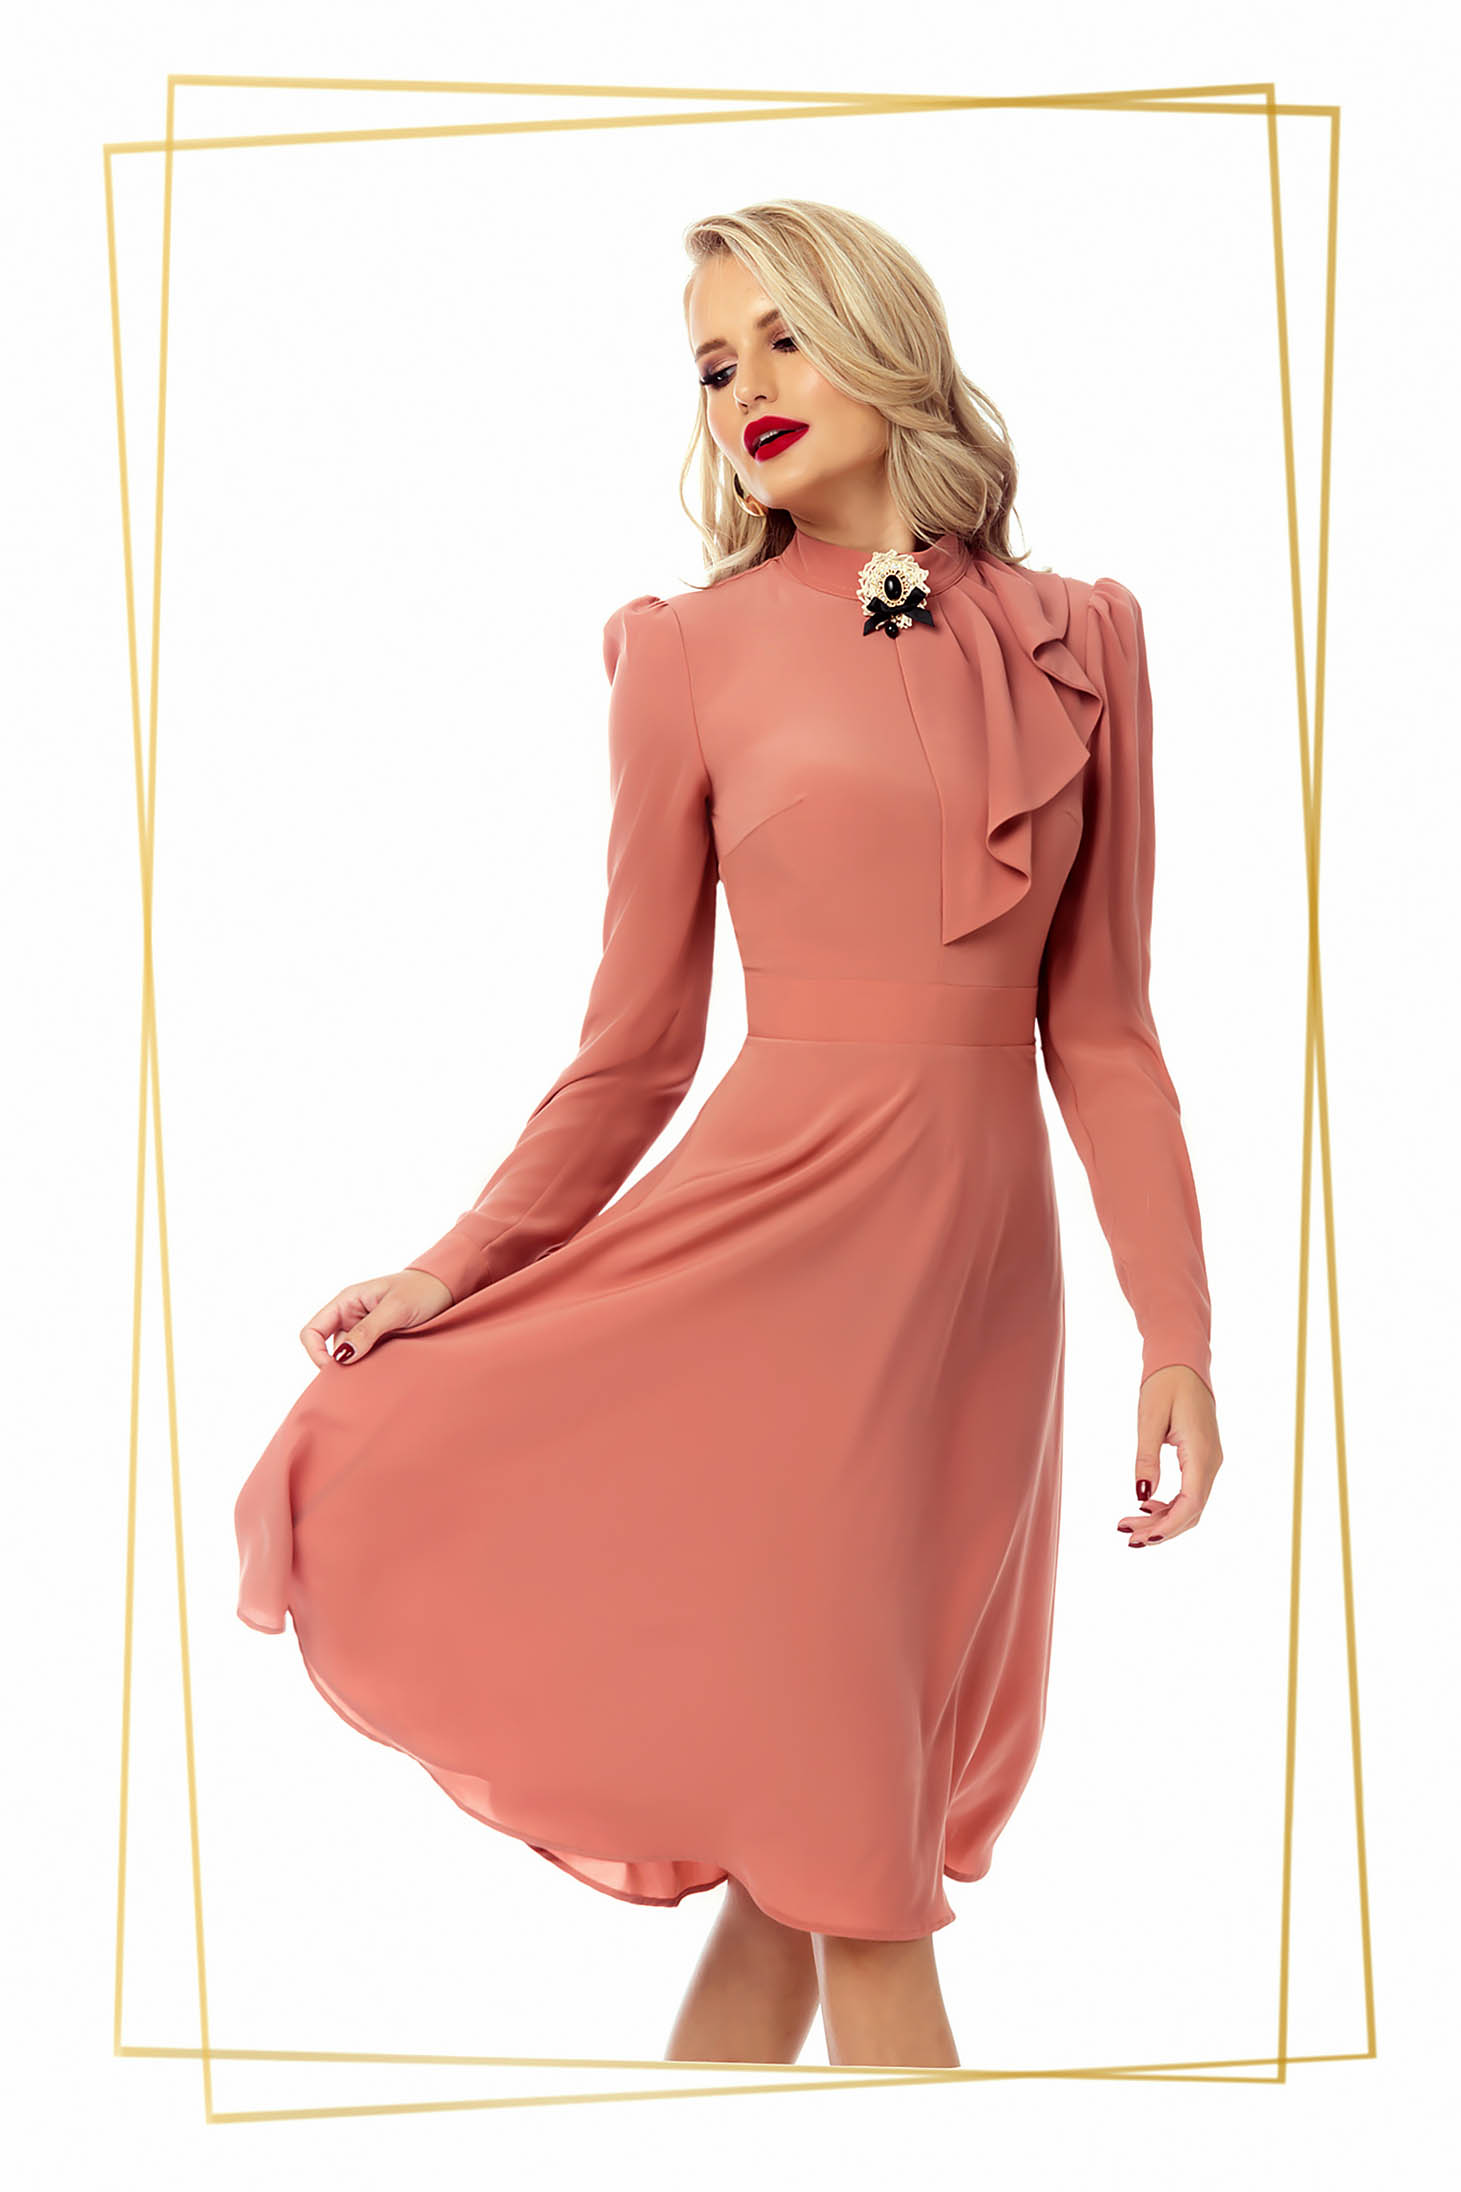 Dress lightpink elegant cloche voile fabric accessorized with breastpin